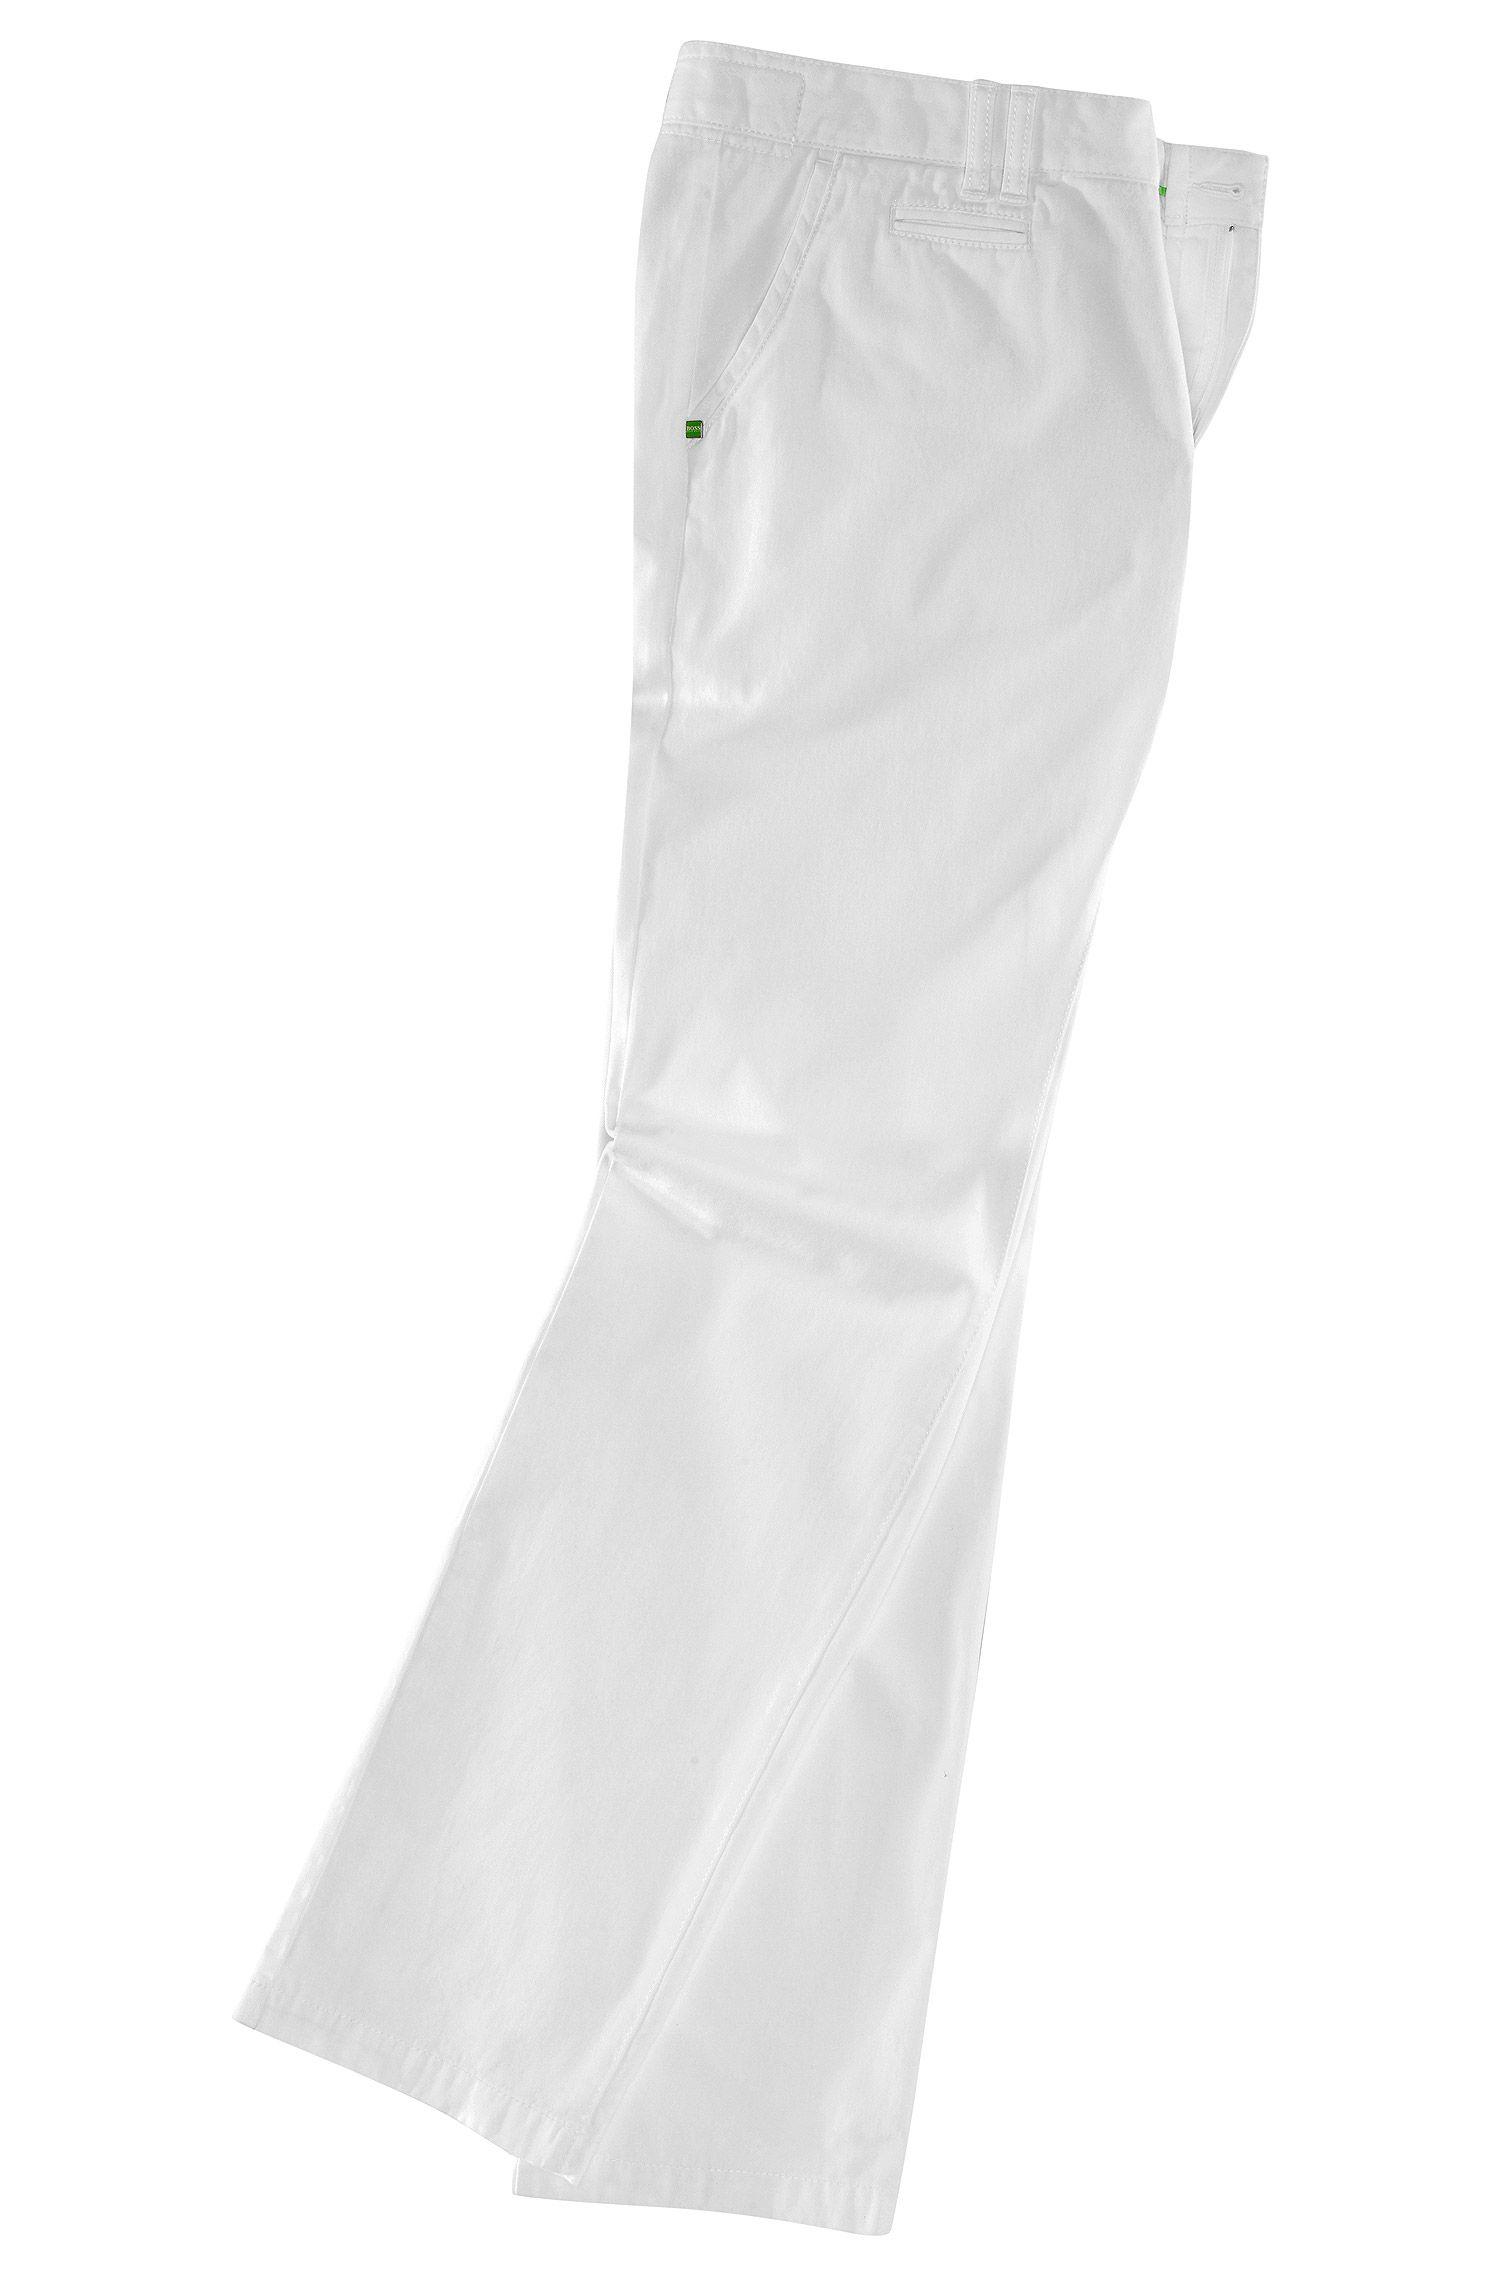 Jeans ´Lillon 2-W` mit Paspeltaschen hinten